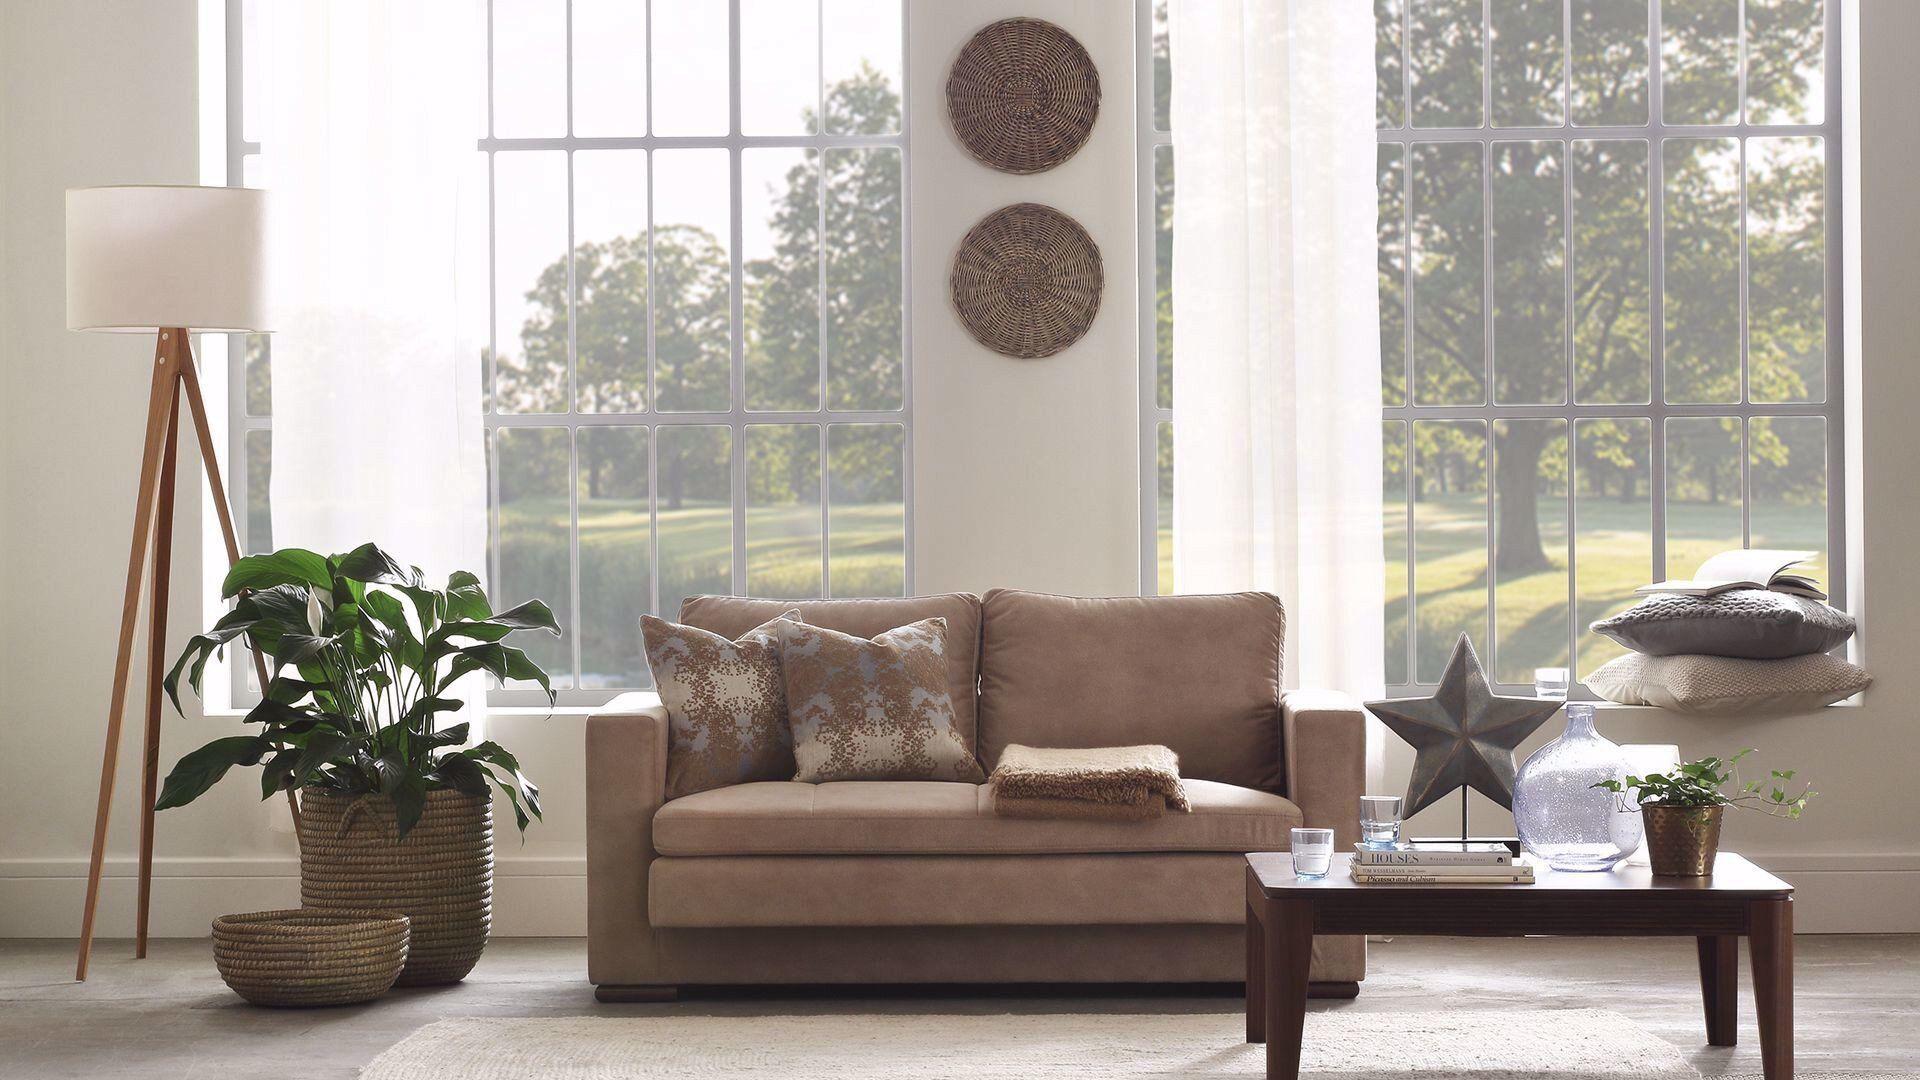 Dogtas Pearl Ikili Koltuk Mobilya Decoration Homedecoration Furniture 2020 Mobilya Fikirleri Ev Dekoru Koltuklar